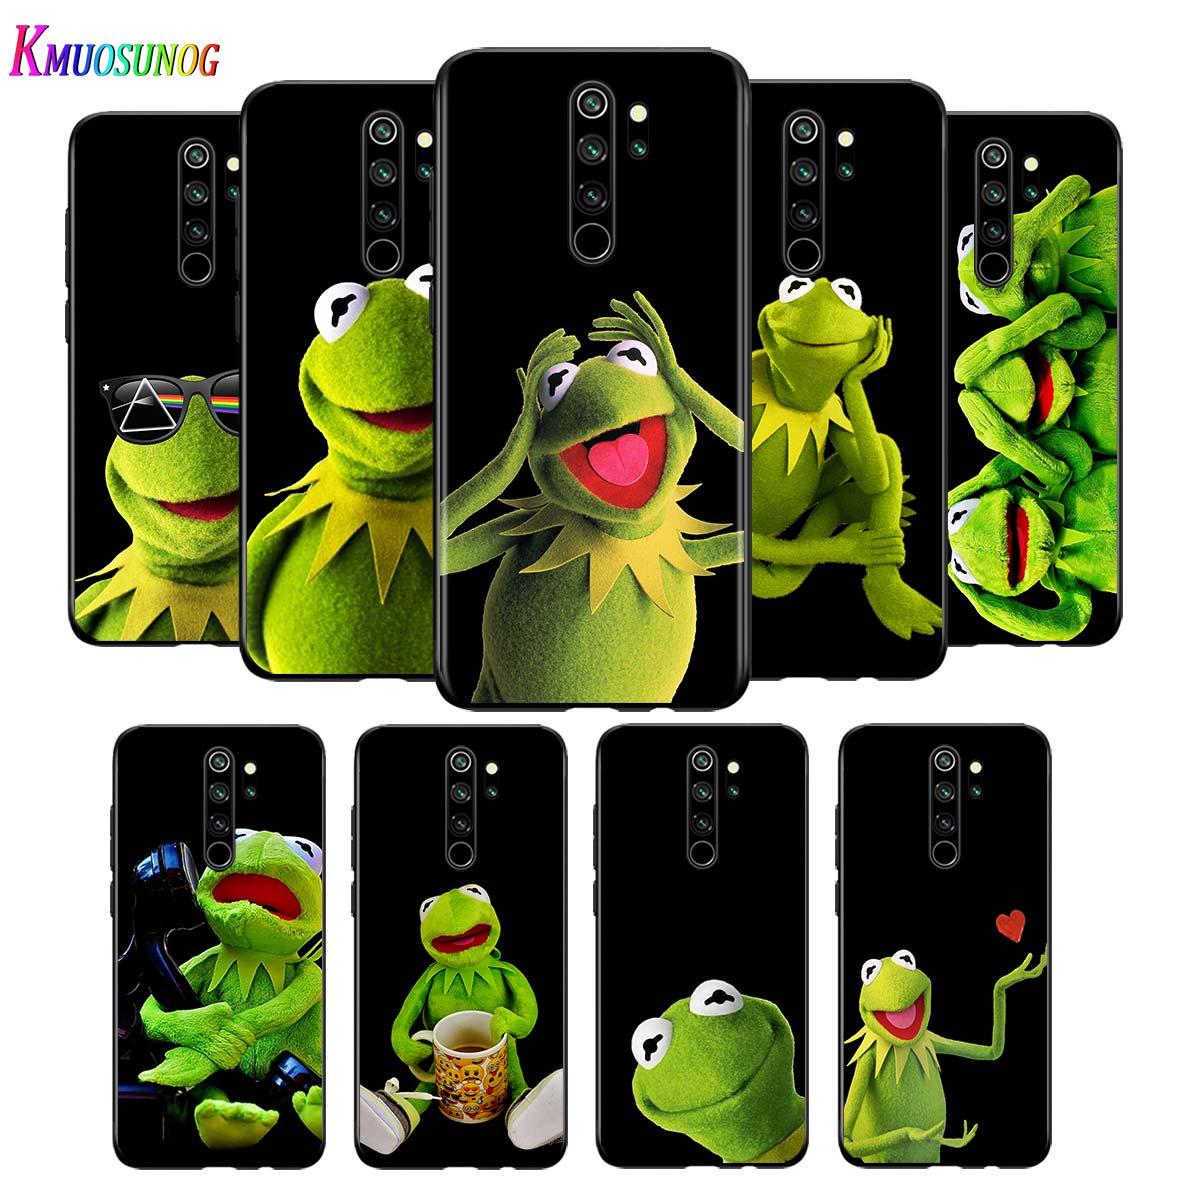 Para Xiaomi Redmi Nota 9 9 Max teléfono caso la rana de Xiaomi 8T 8 7 6 5 Pro 5A 4X 4 negro de la cubierta del teléfono